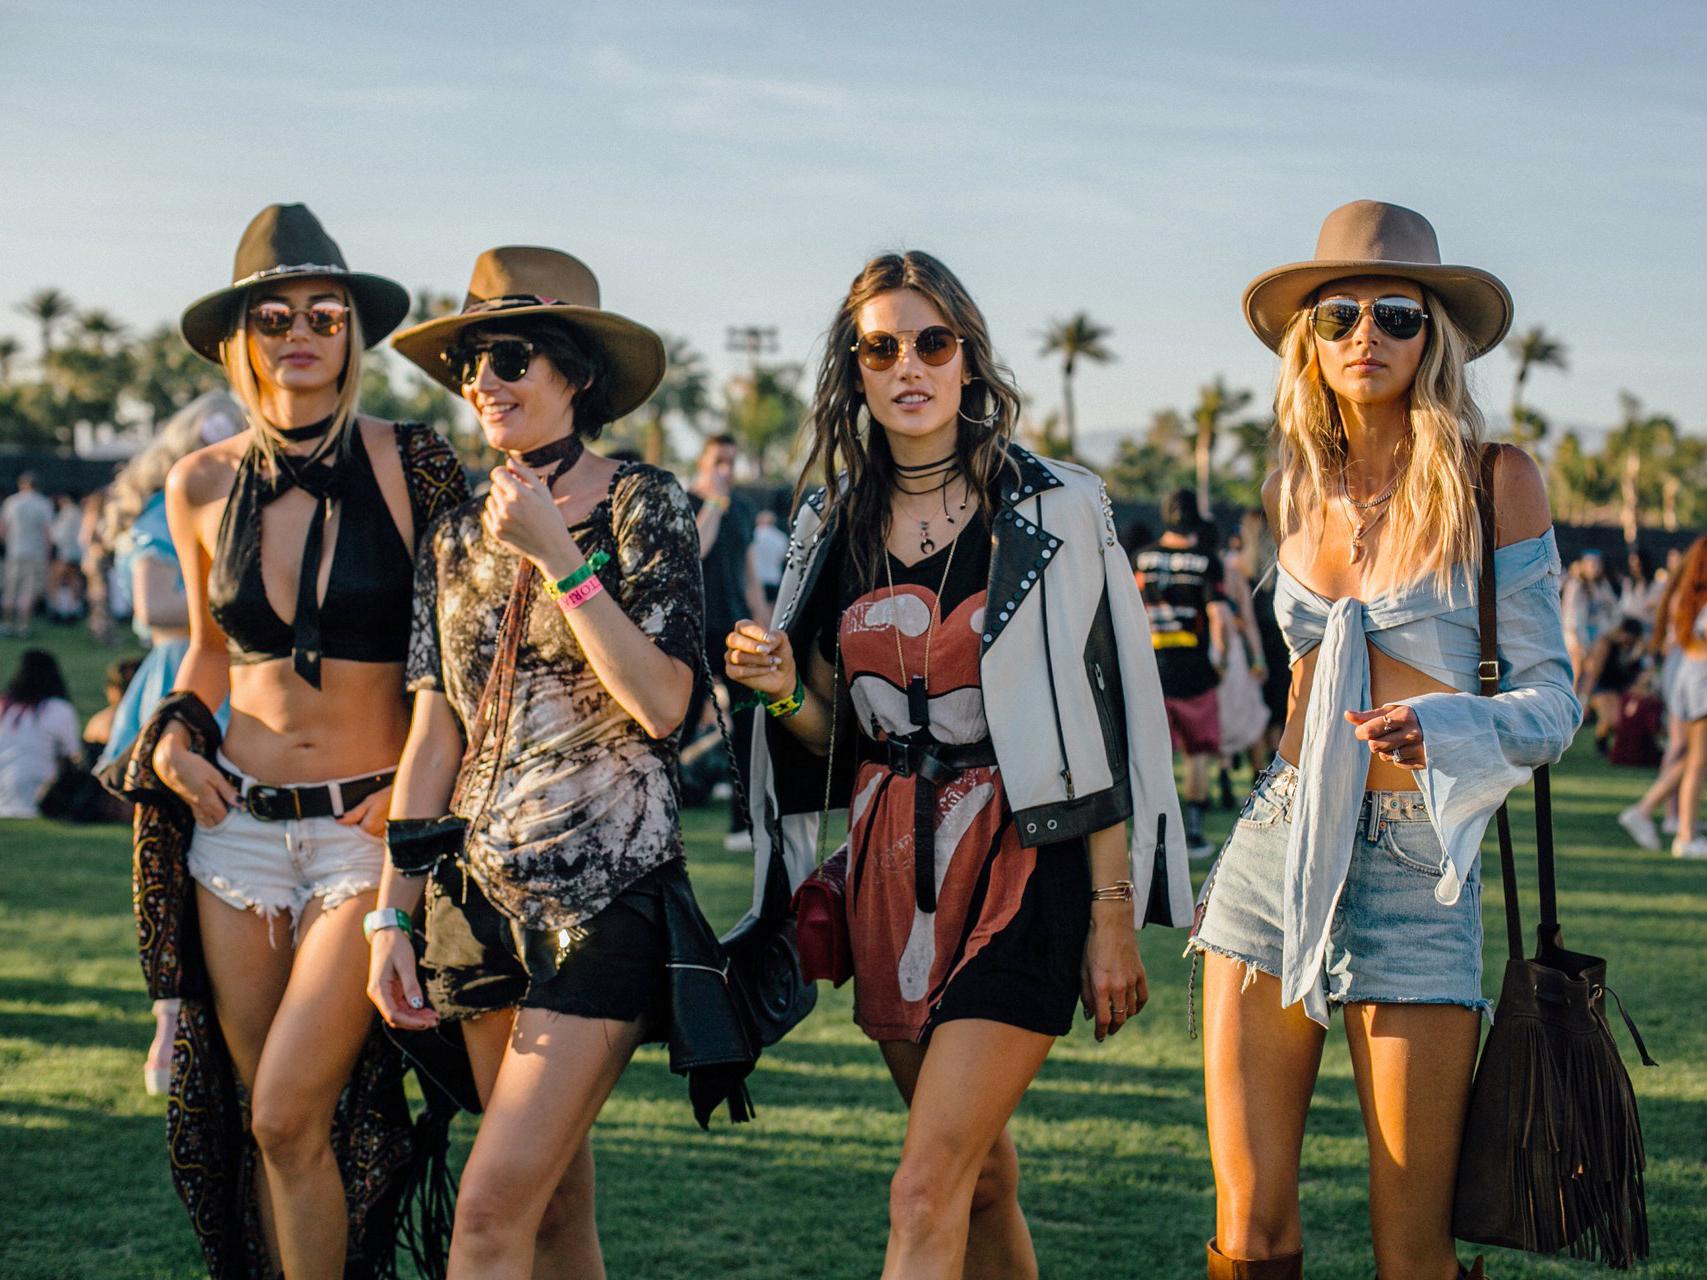 Street style @ Coachella 2018 vogue.jpg